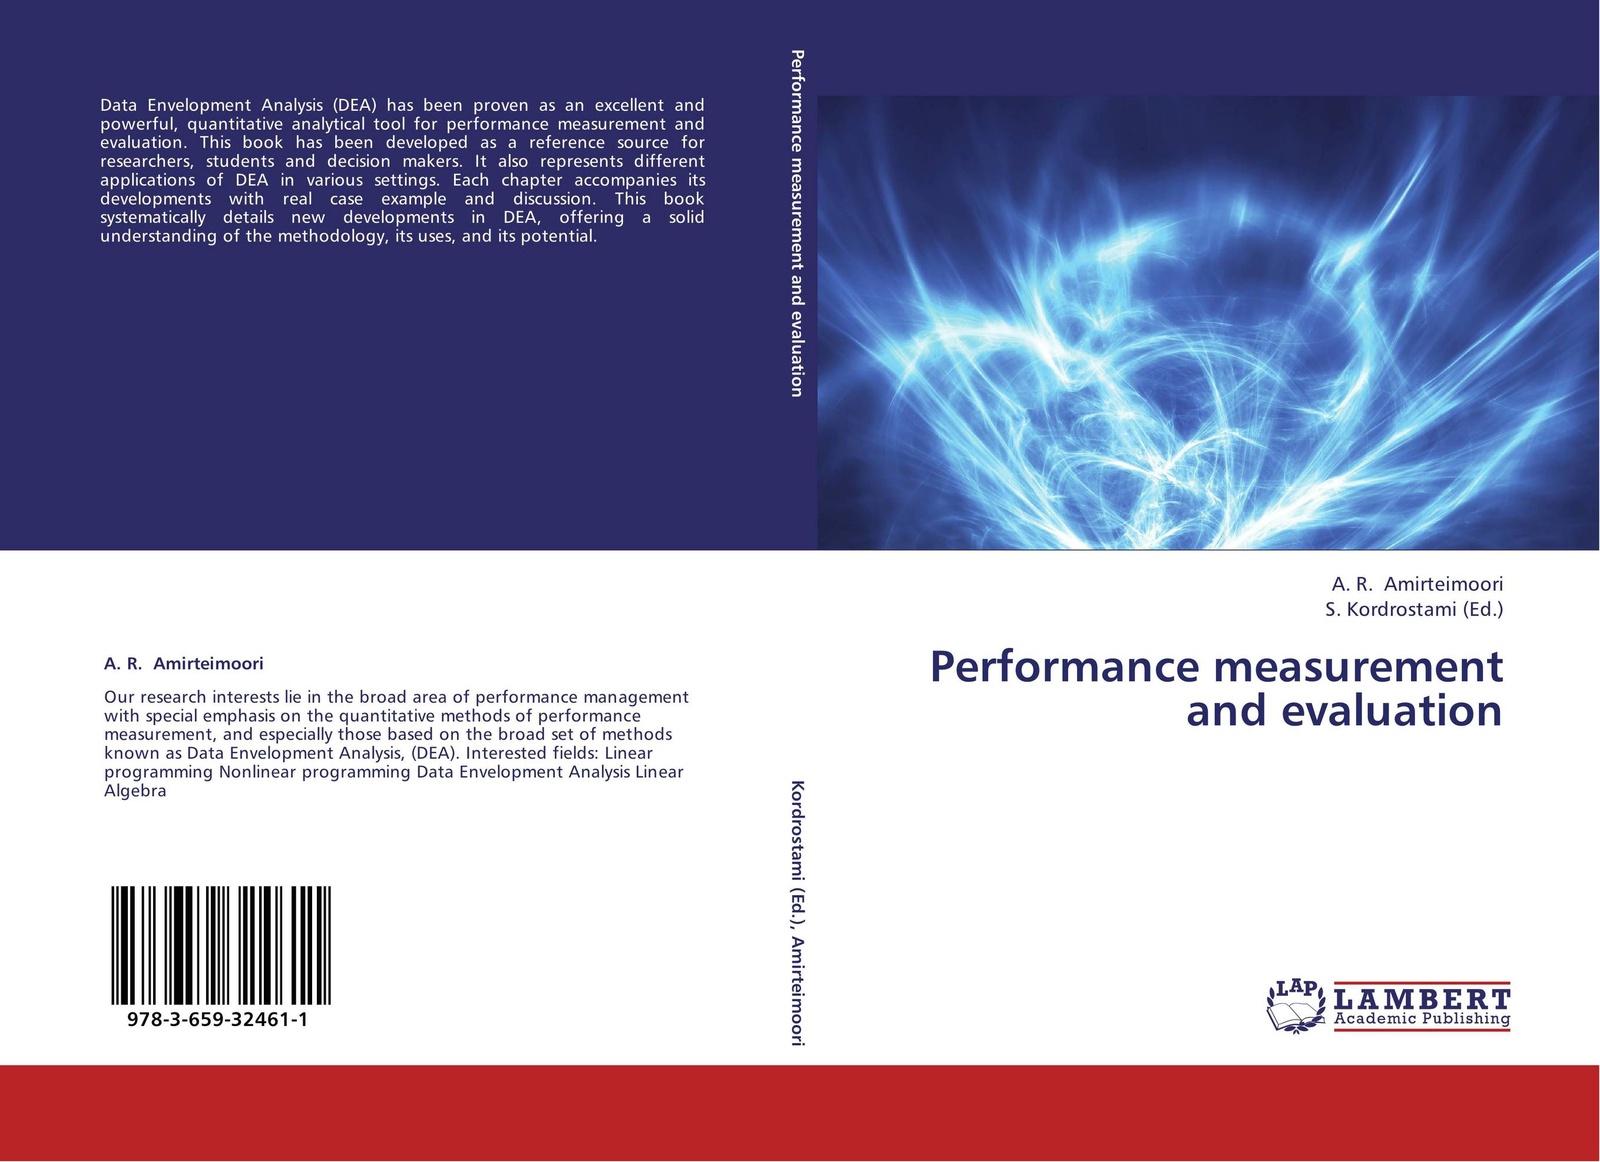 A. R. Amirteimoori and S. Kordrostami Performance measurement and evaluation bendat julius s random data analysis and measurement procedures